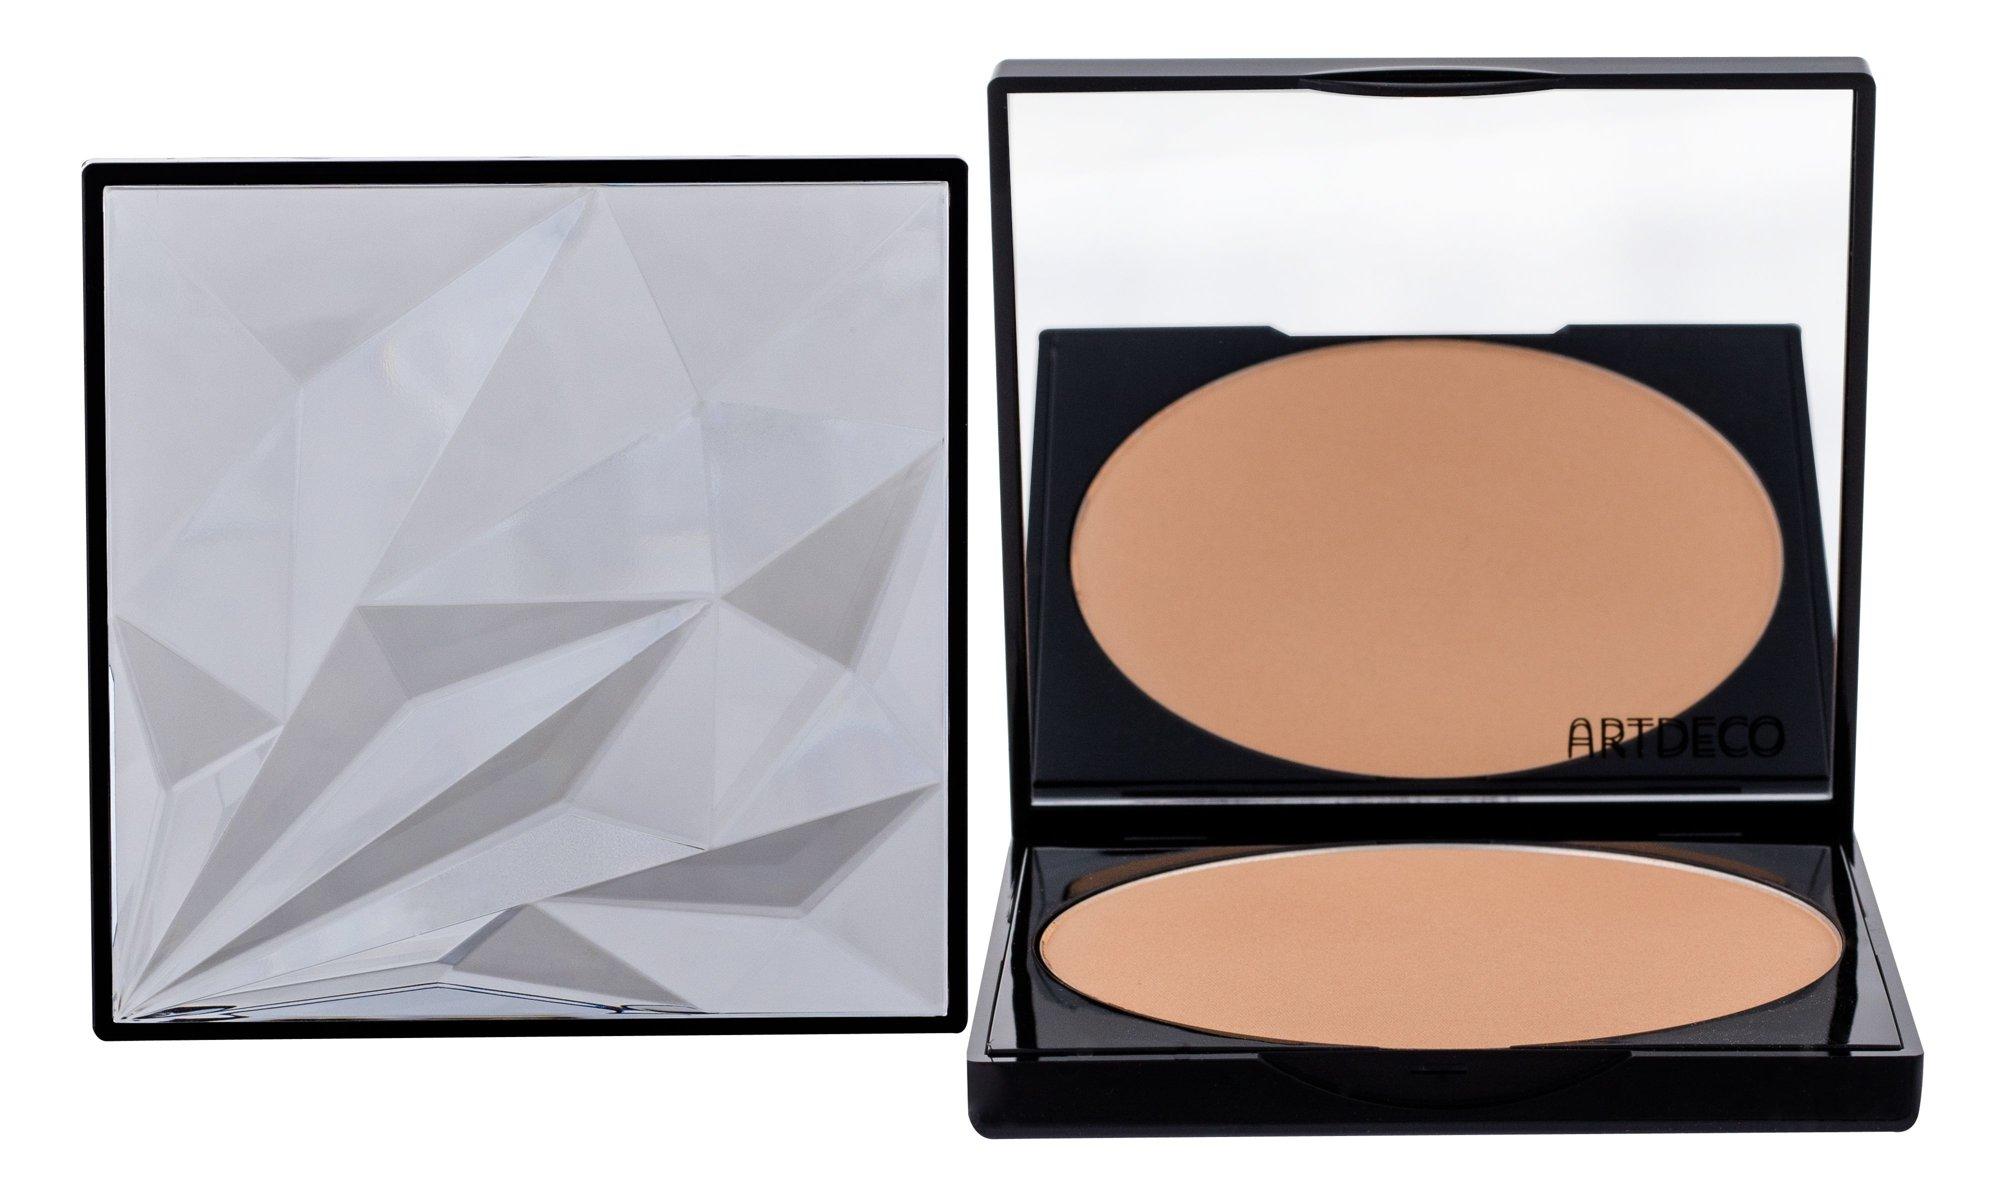 Artdeco Translucent Shimmer Powder Powder 15ml Breeze of Fame